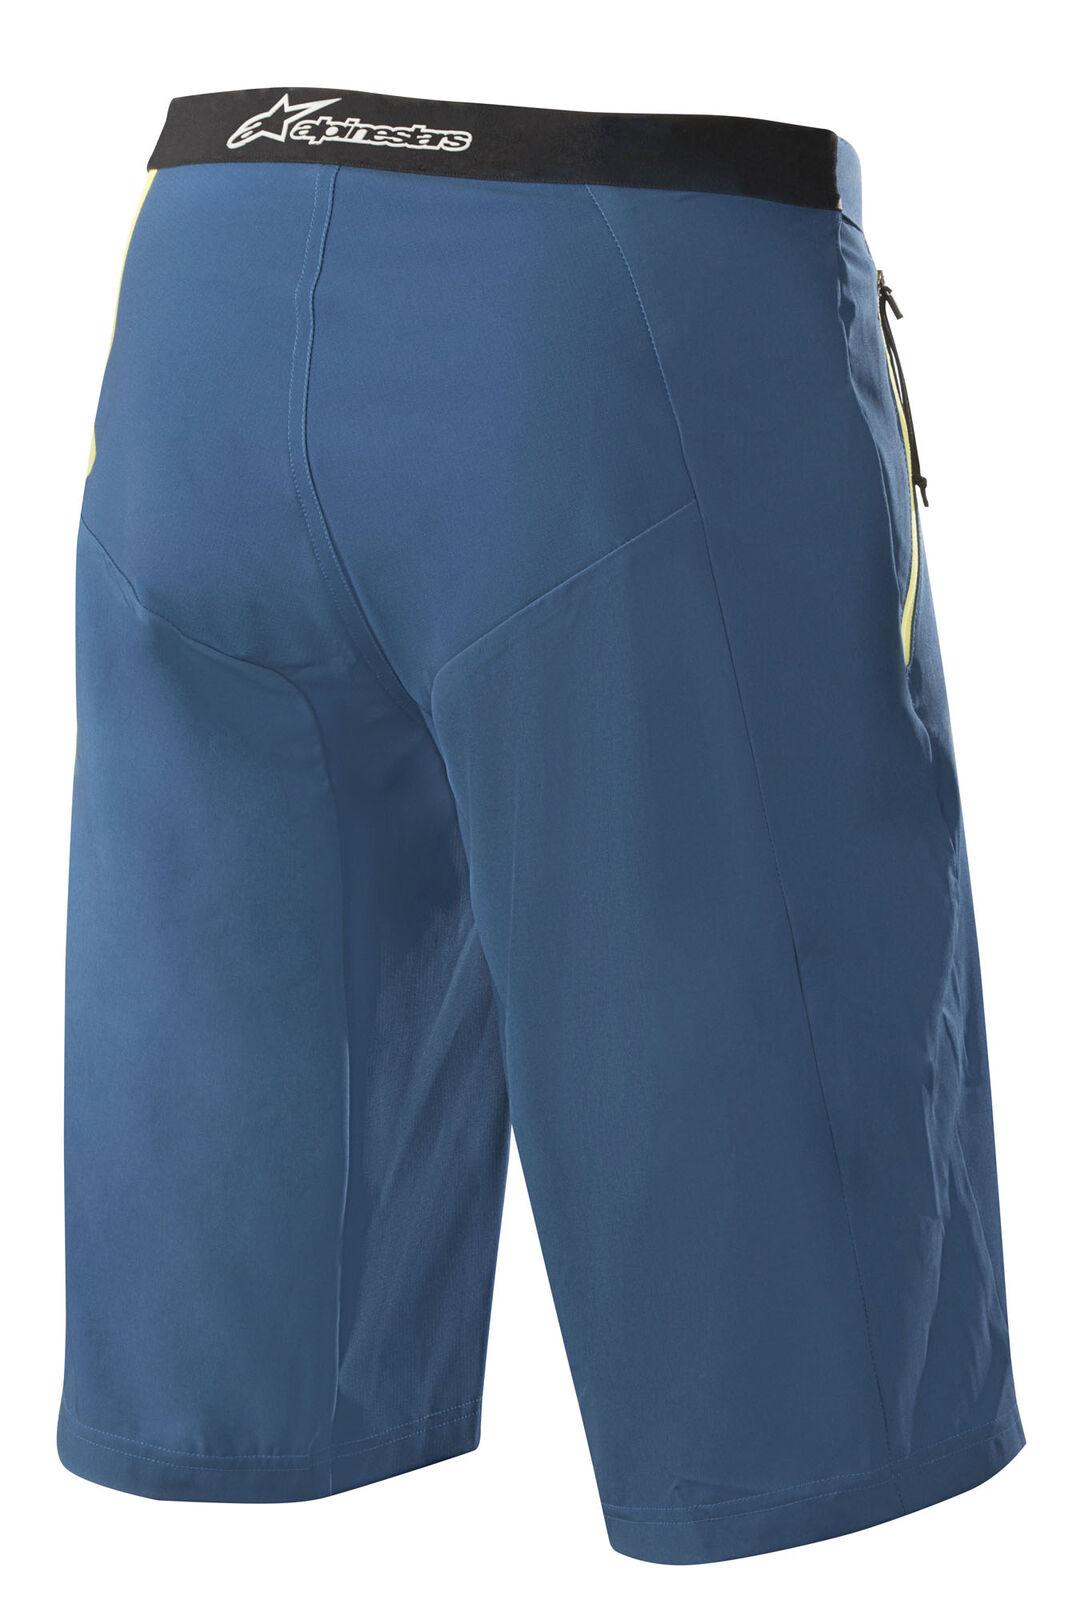 1722618 Alpinestars Baggy  Herren Mesa Baggy Alpinestars Shorts Knee Length Downhill Mountain Bike 51287e